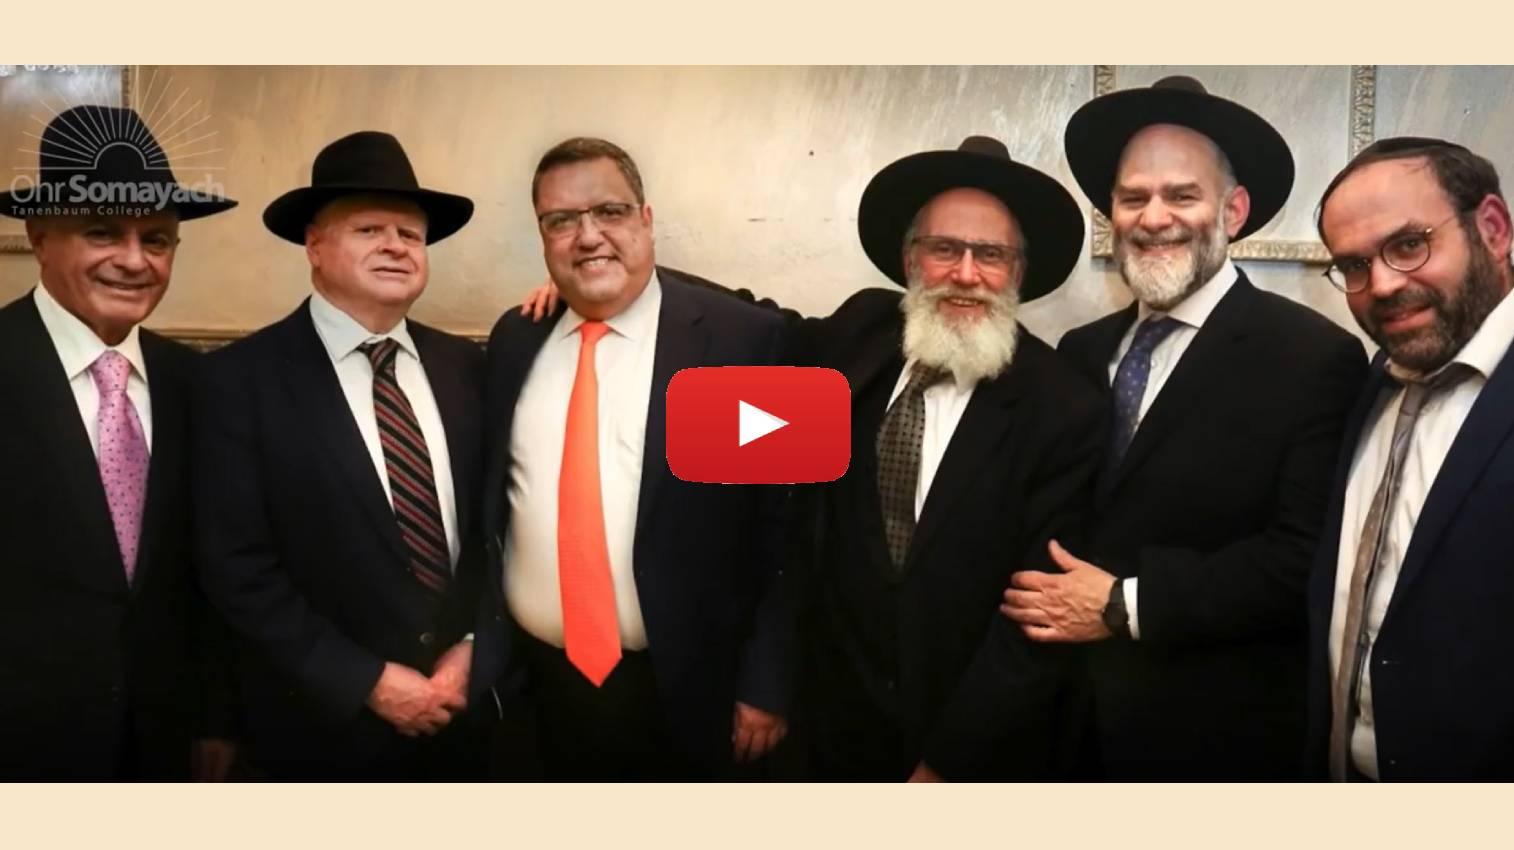 Specifying the Origin - Ohr Somayach's New Beis Midrash